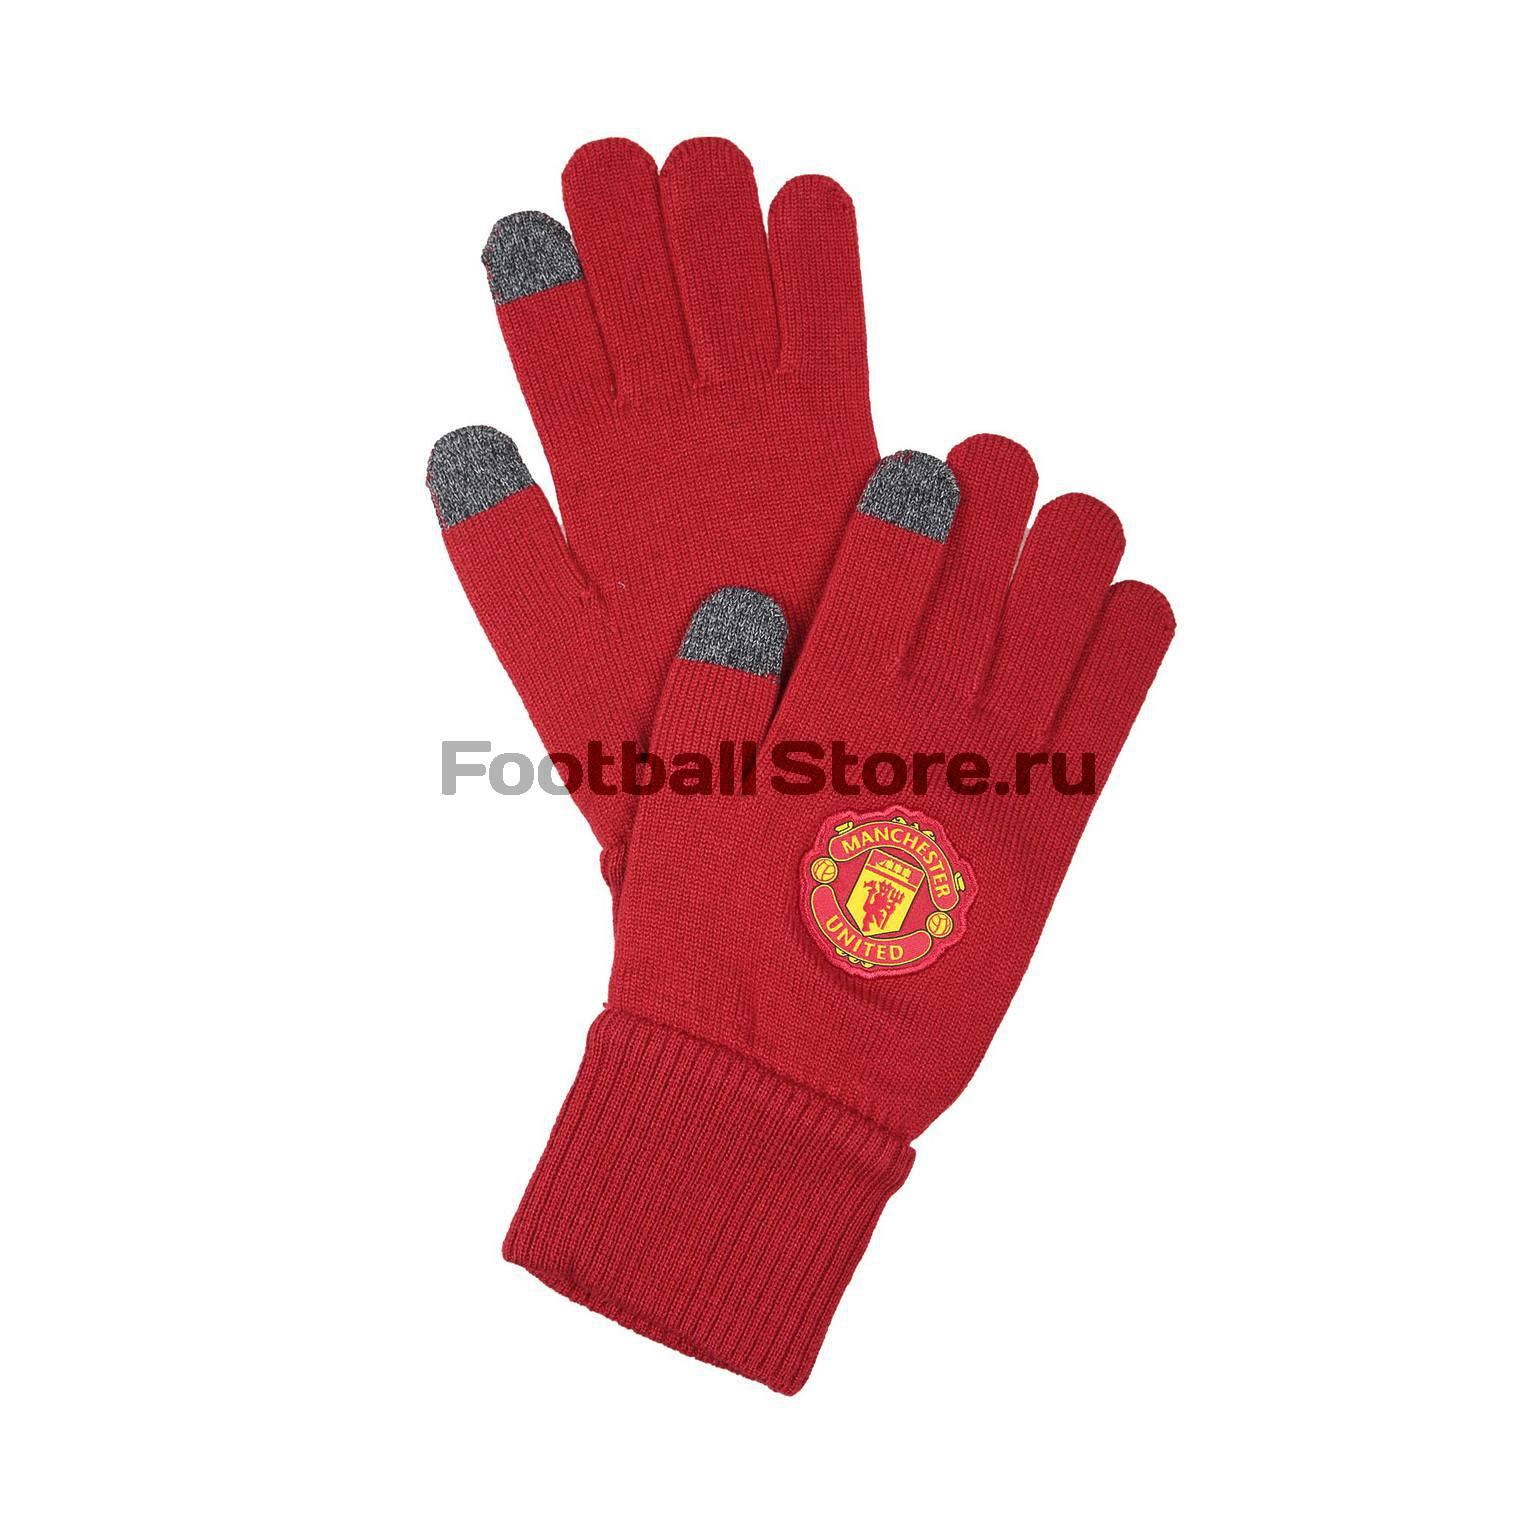 Manchester United Adidas Перчатки тренировочные Adidas Manchester United Gloves S95093